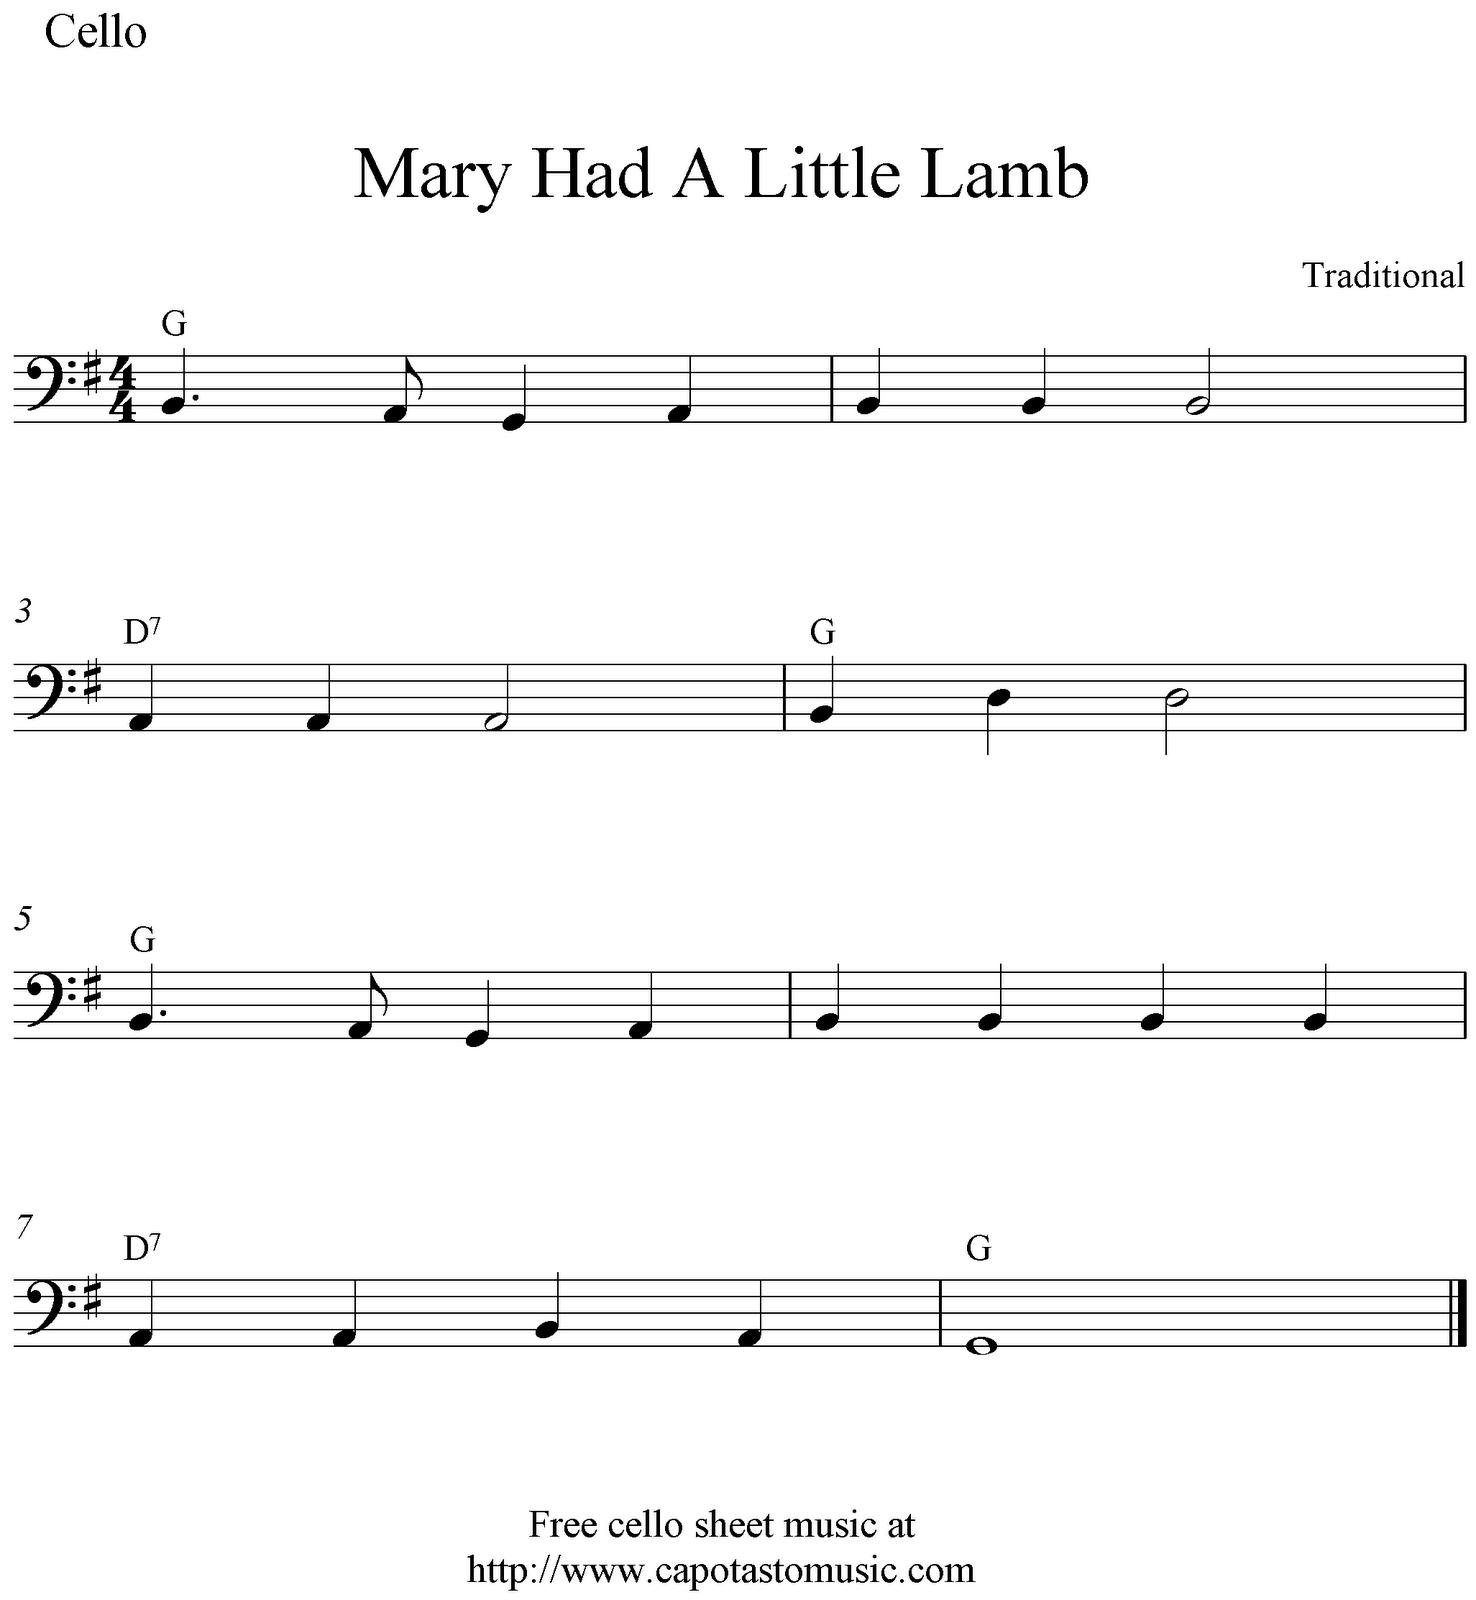 Easy Cello Music For Beginners